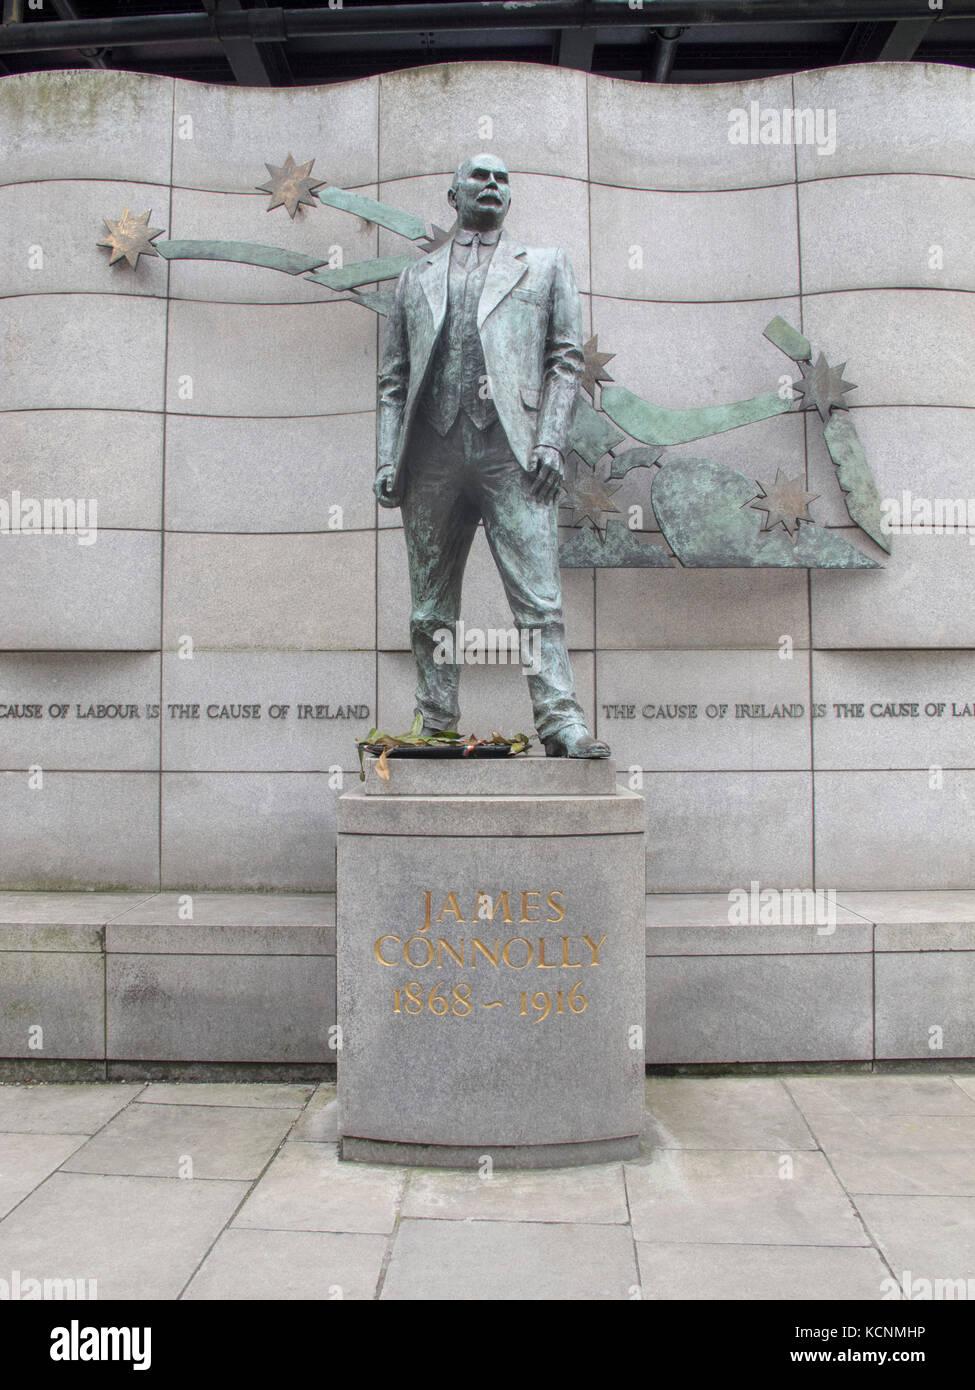 James Connolly statue in Dublin, Ireland Stock Photo